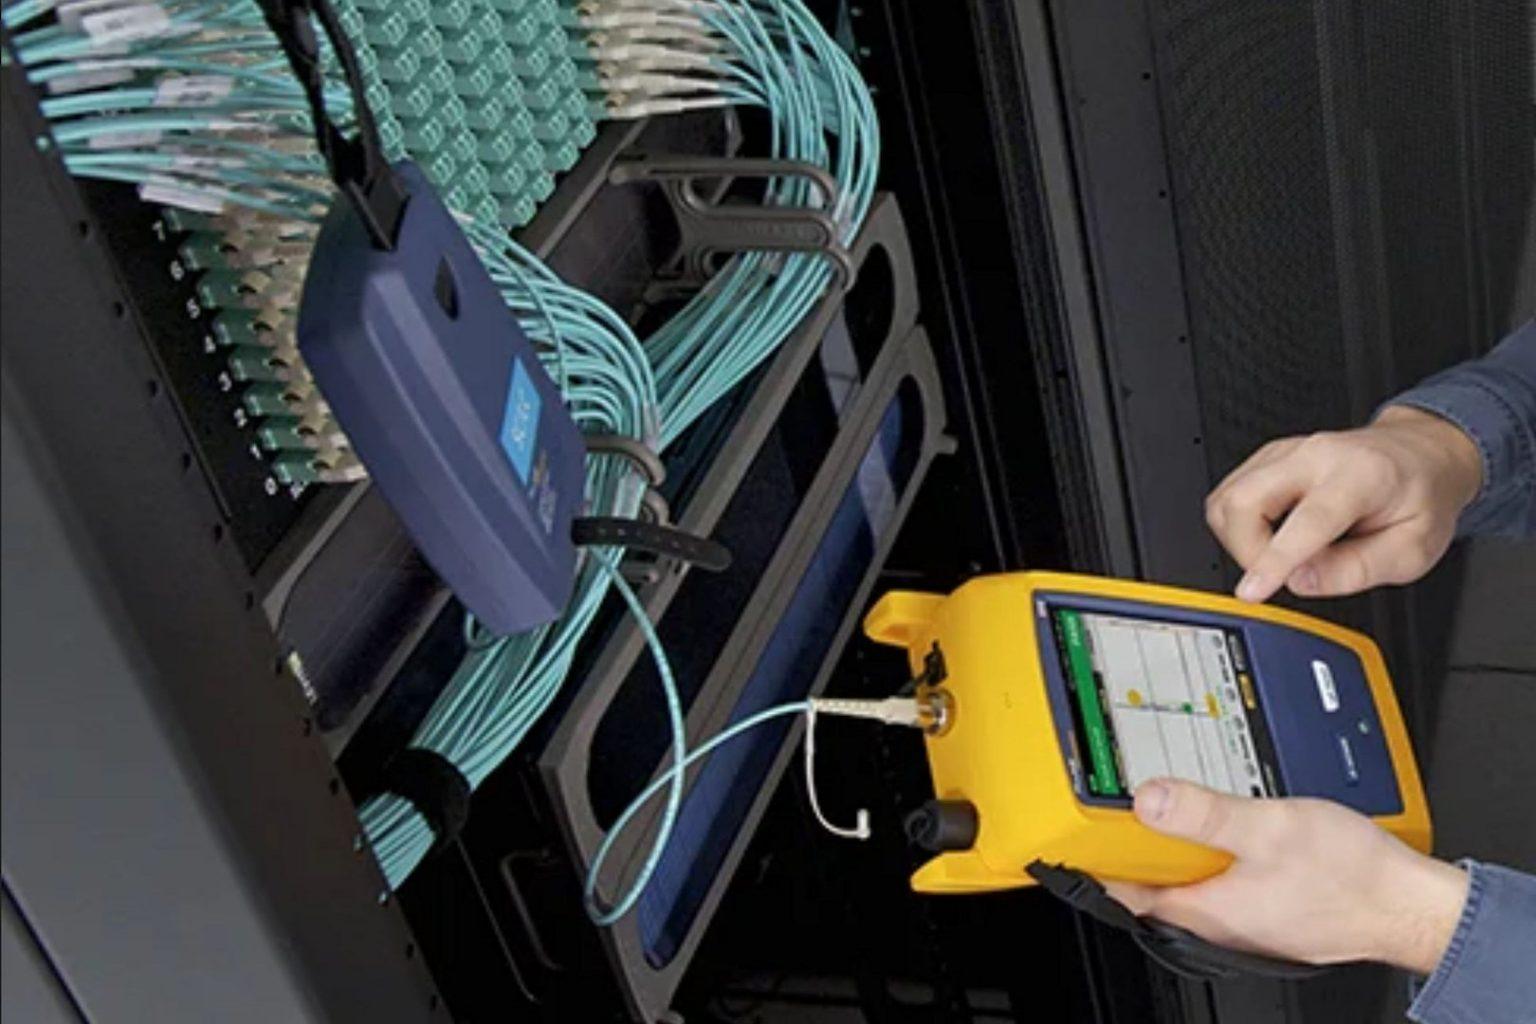 microngroup-fluke-dsx-versiv-data-tester-communications-panel-testing-fibre-optic